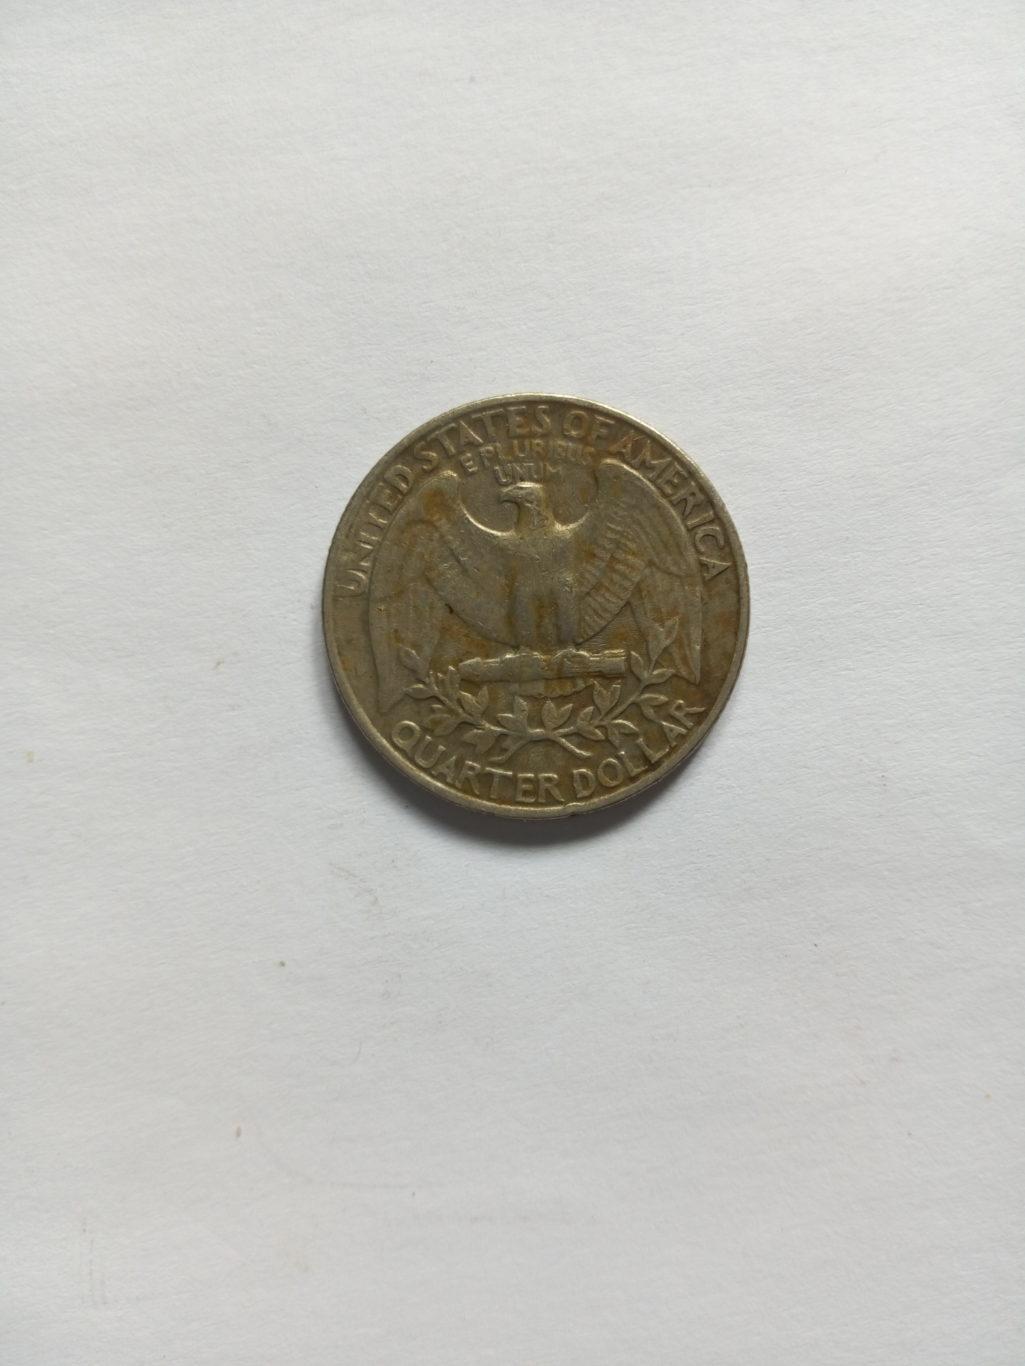 1984_quarter dollar